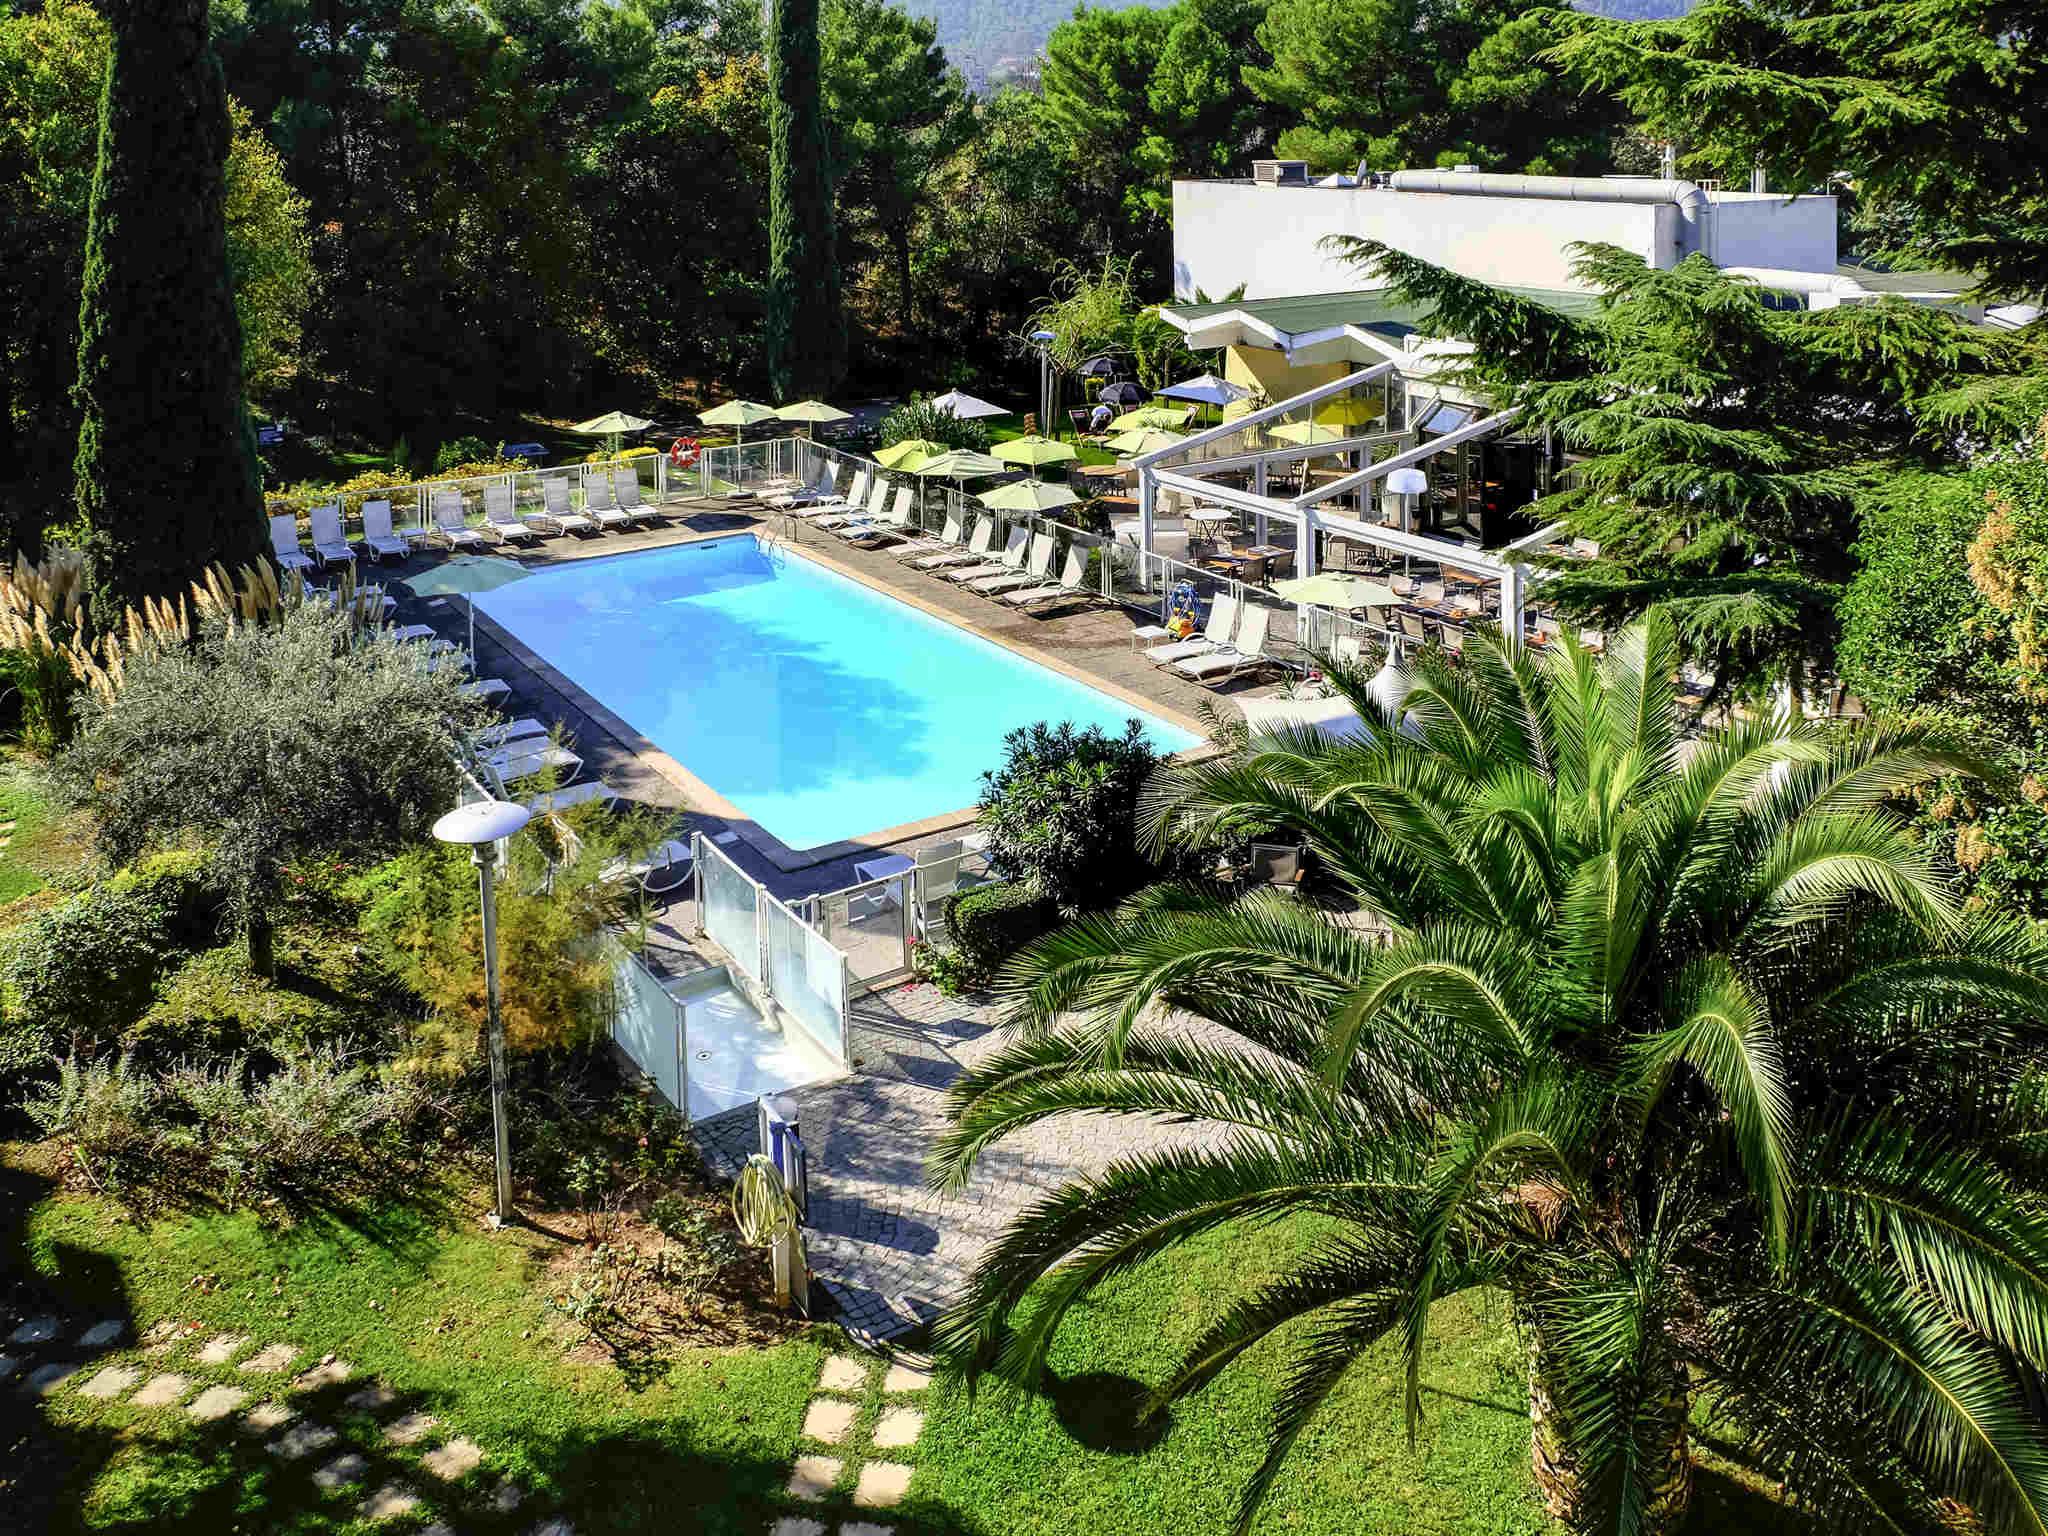 Merveilleux Hotel - Novotel Marseille East